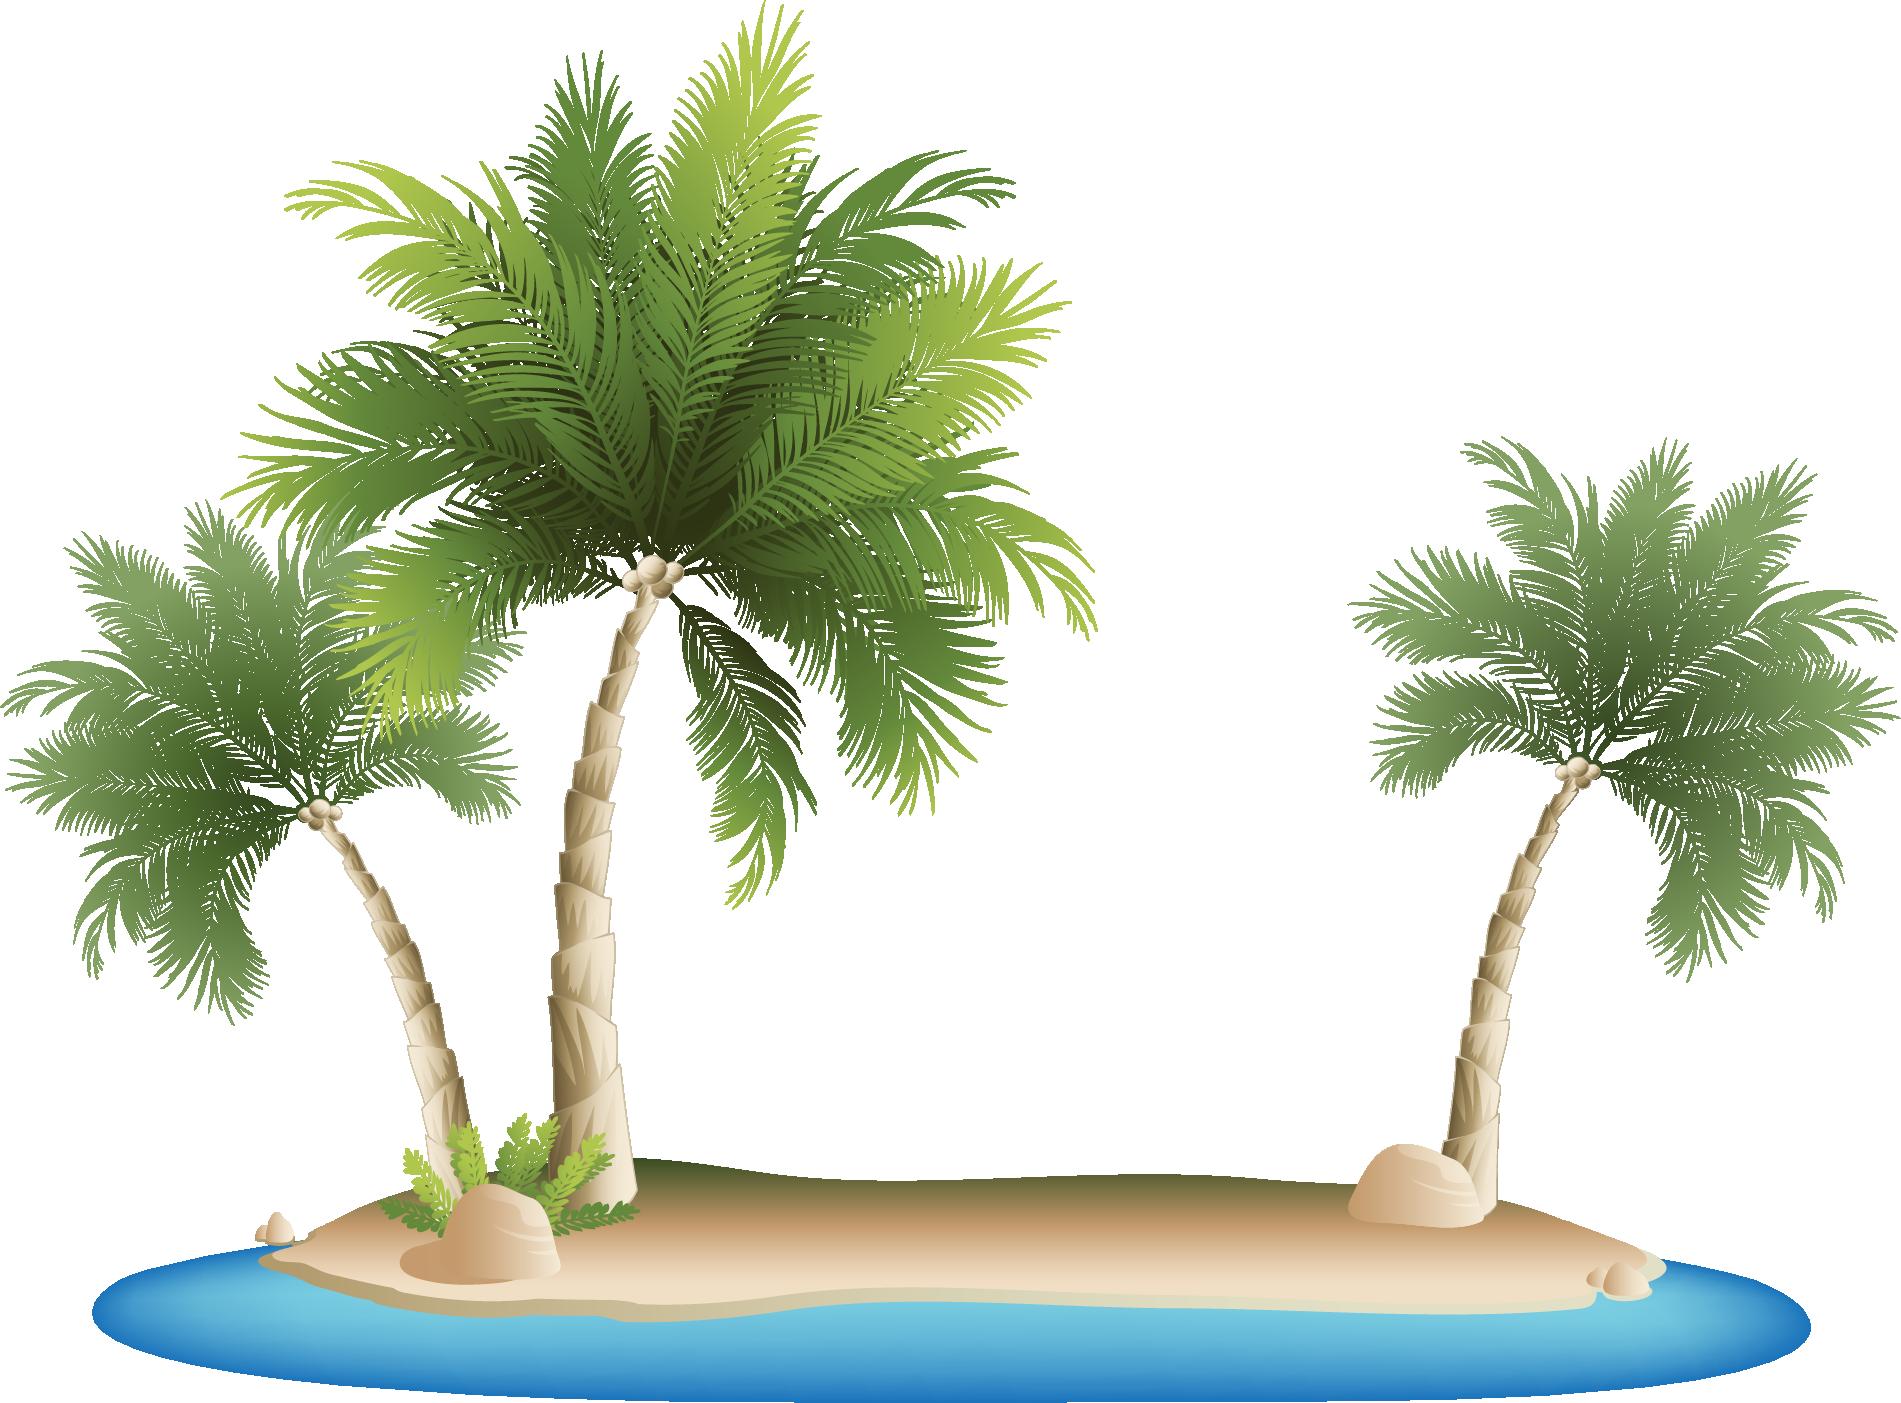 Watermelon clipart tropical. Palm islands resort clip